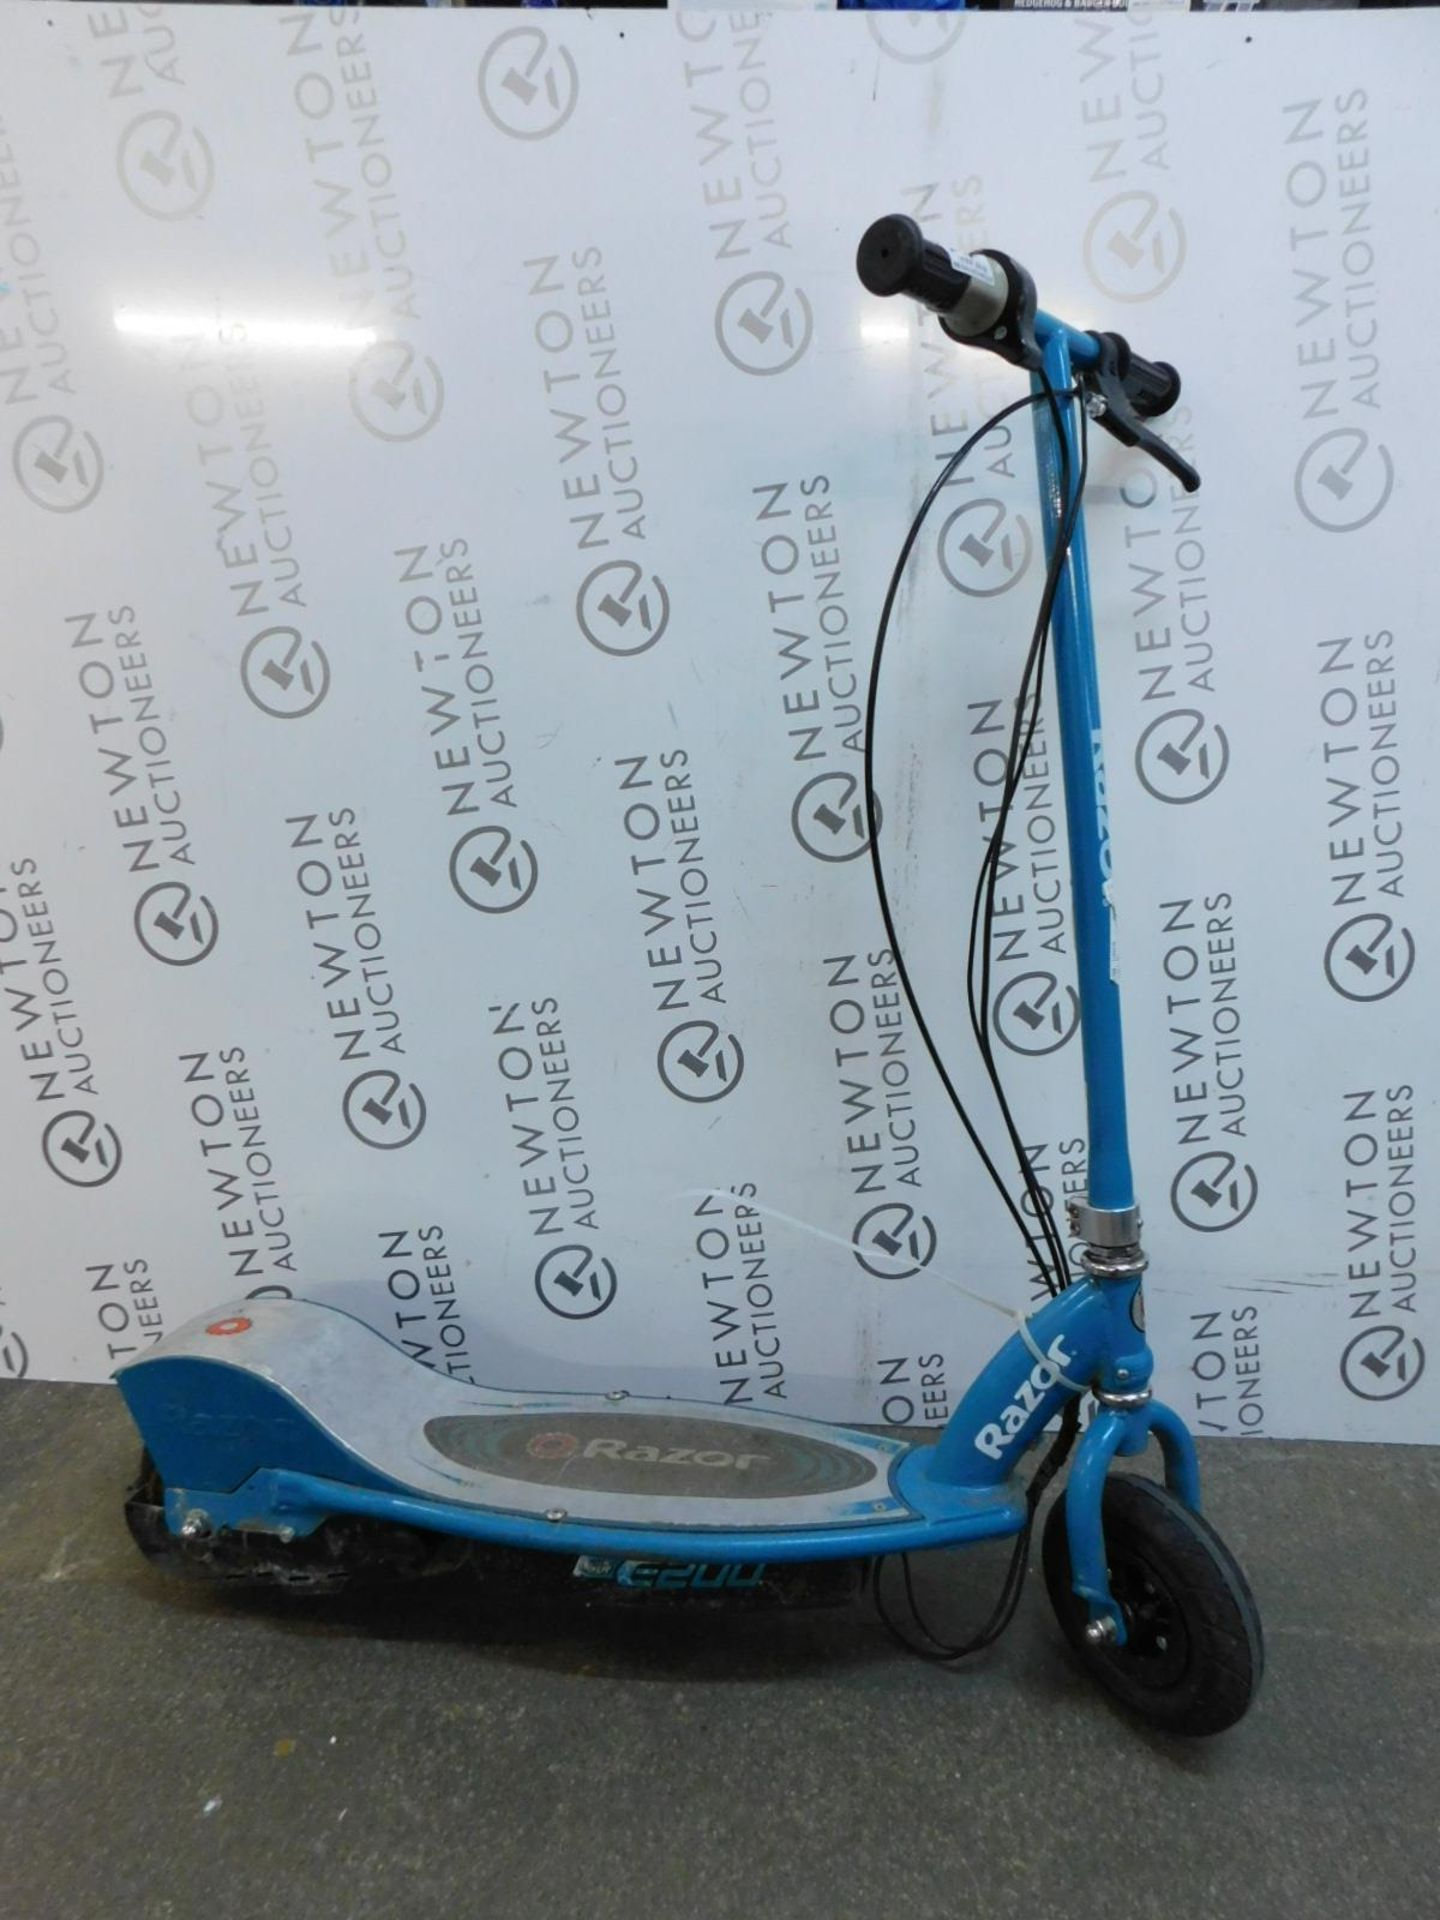 Lot 634 - 1 RAZOR POWER CORE E200 BLUE ELECTRIC SCOOTER RRP £239.99